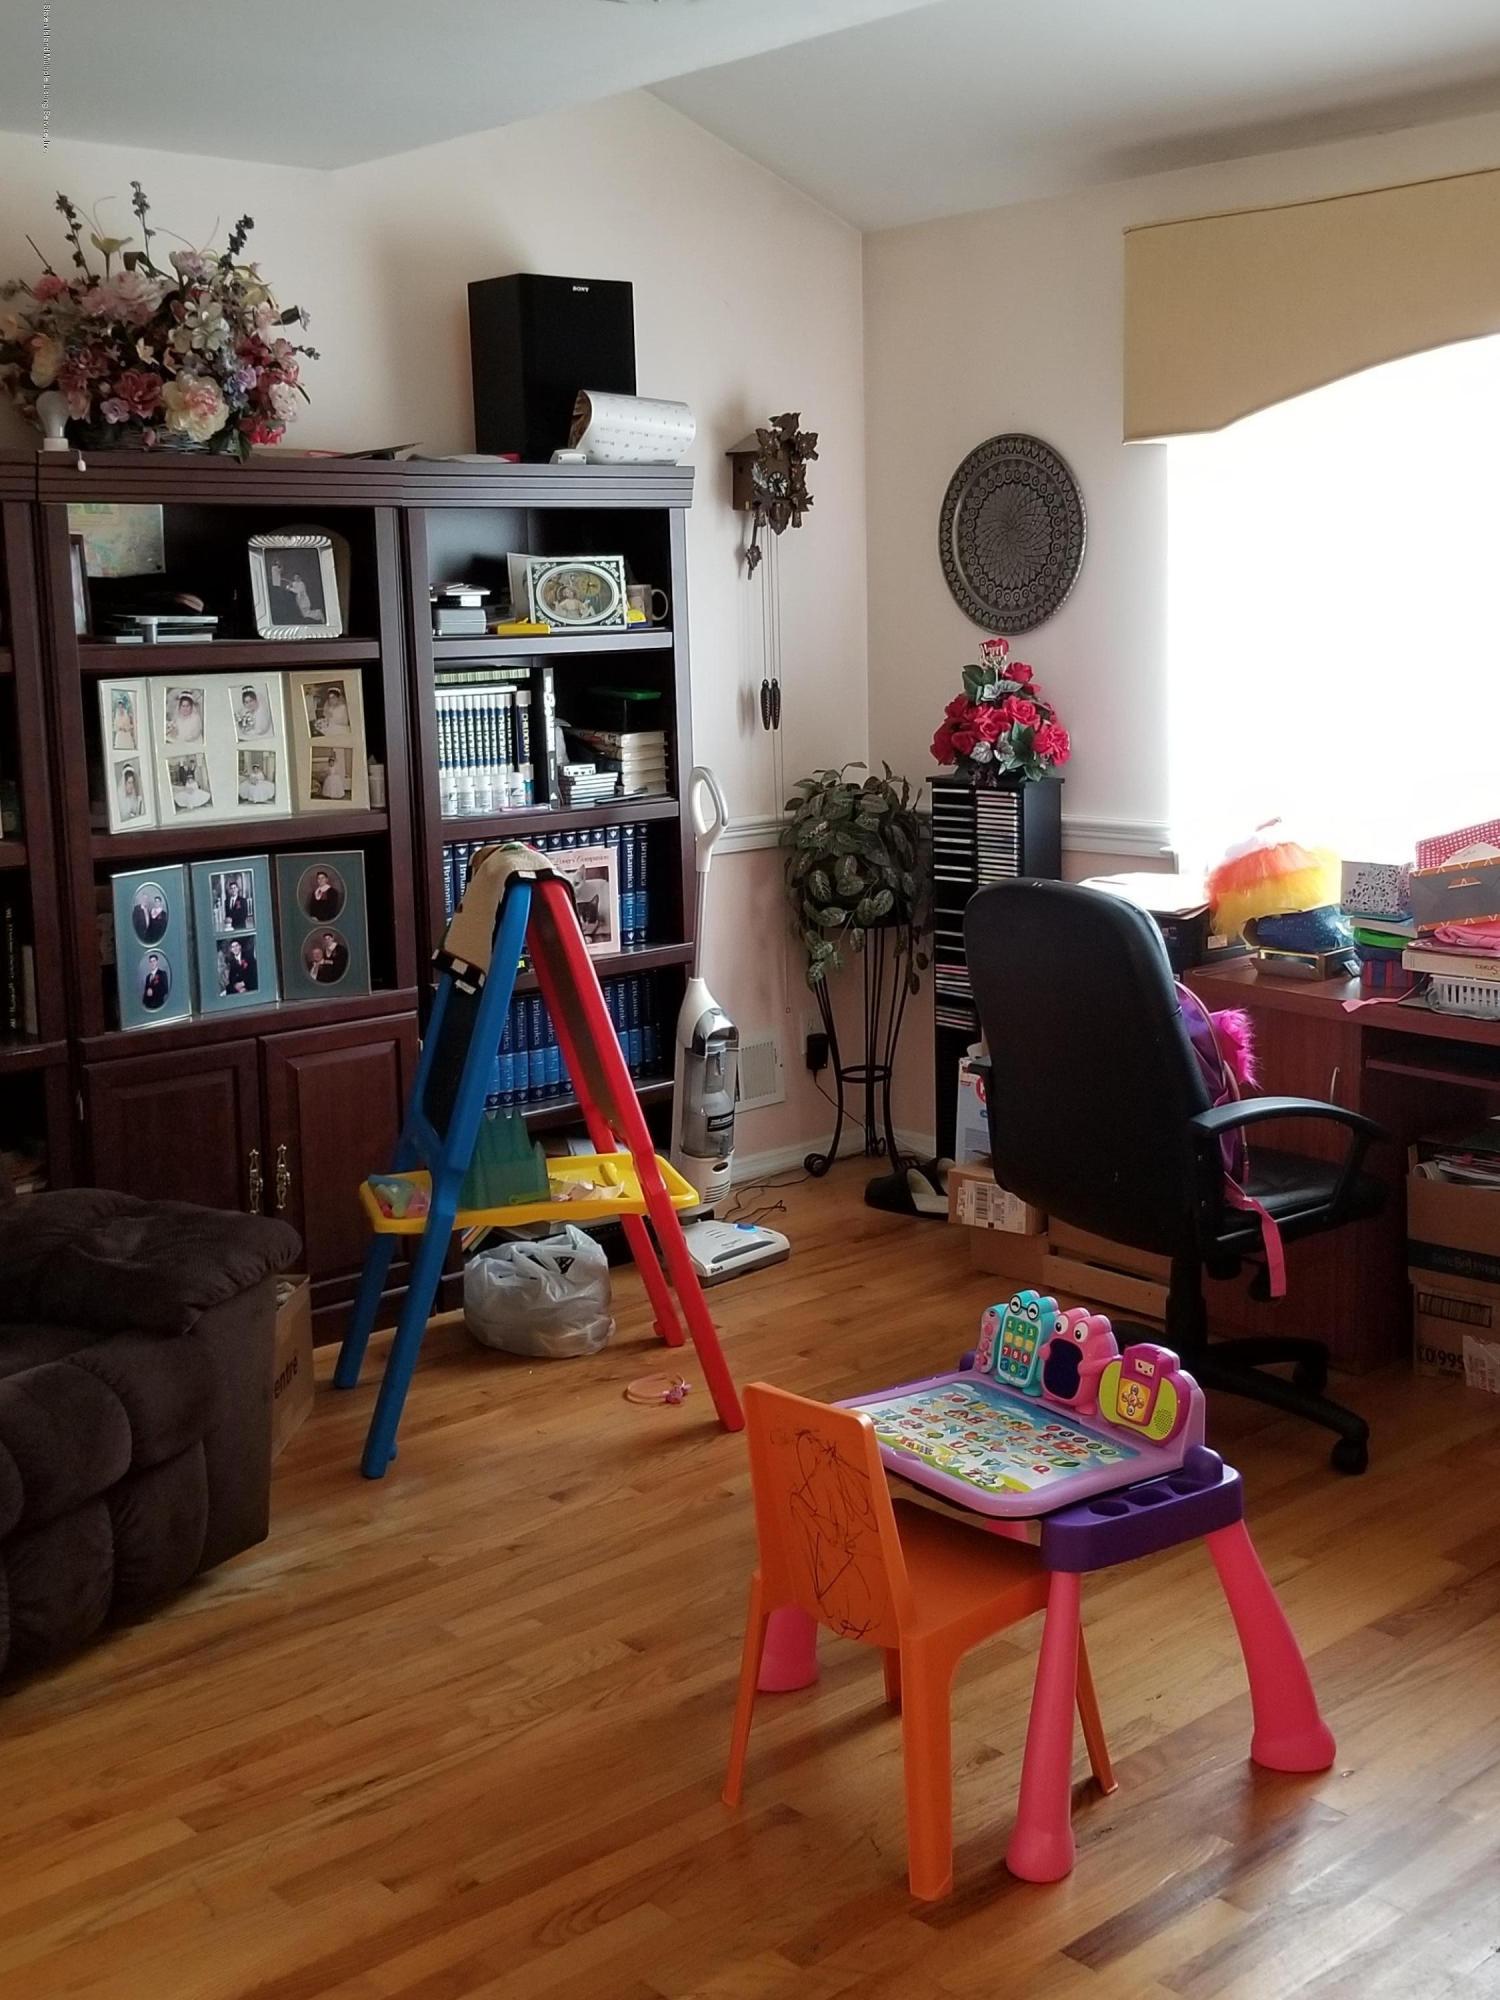 Single Family - Detached 92 Meagan Loop  Staten Island, NY 10307, MLS-1123137-15